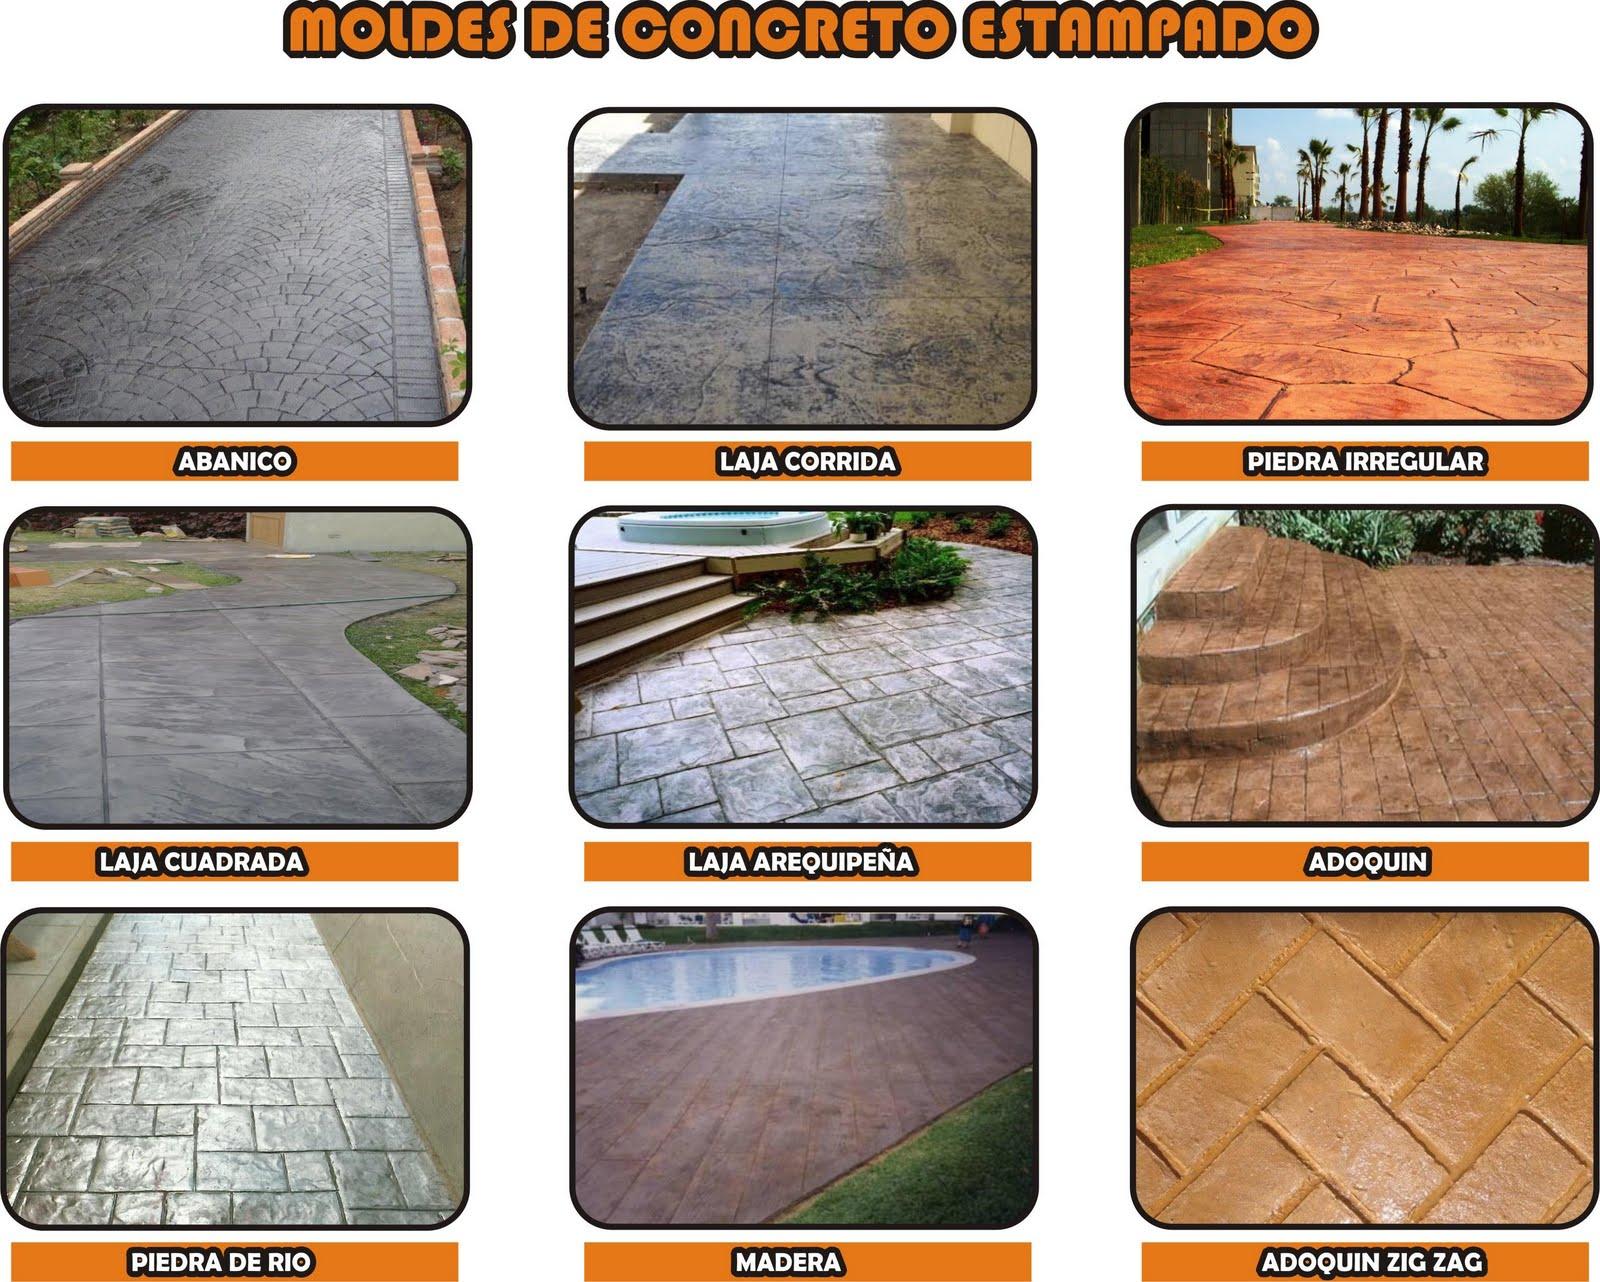 Concreto estampado moldes para concreto estampado - Moldes de cemento ...